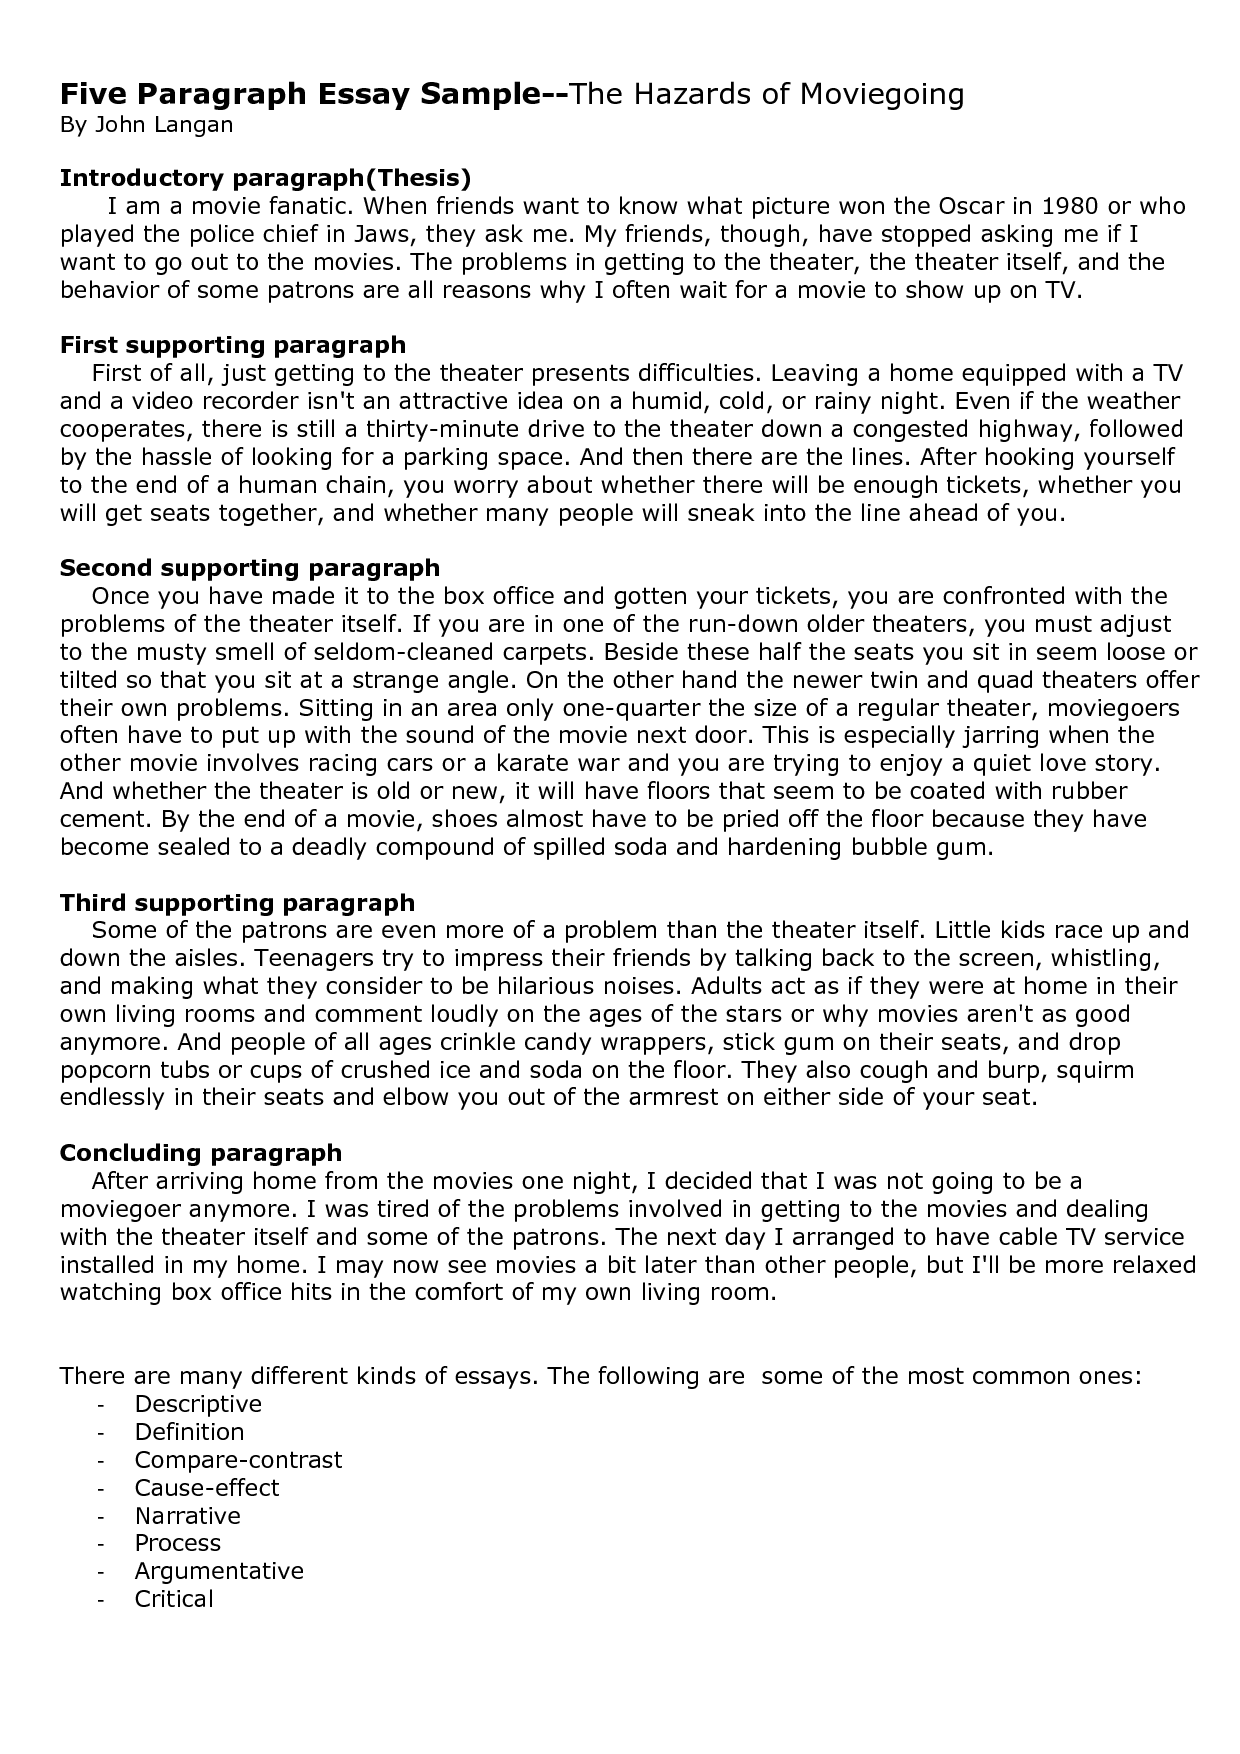 003 U2shuebtjf Paragraph Essay Example Excellent 5 College Pdf Full